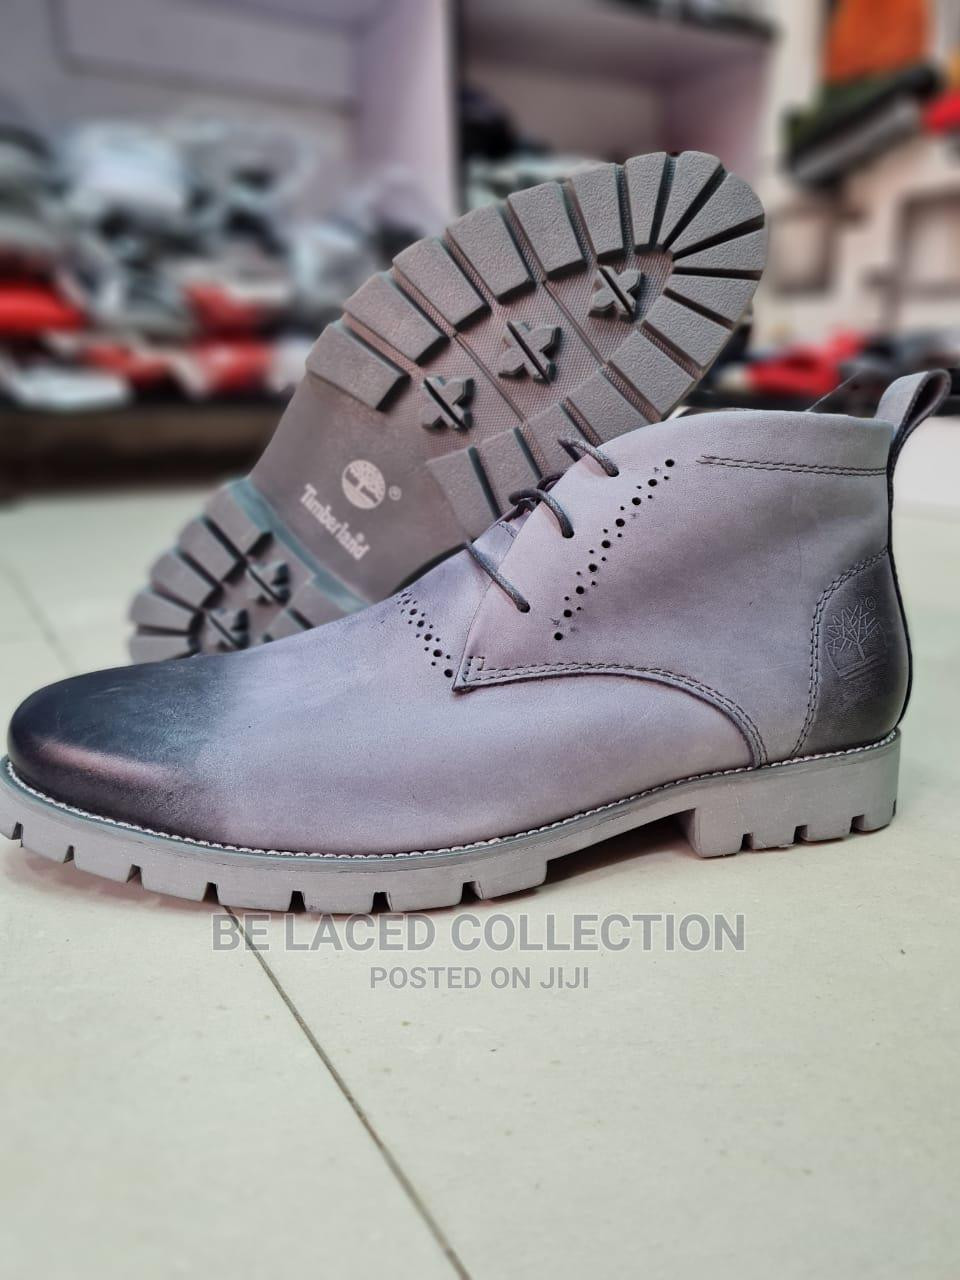 Chelsea Boots. | Shoes for sale in Kilimani, Nairobi, Kenya